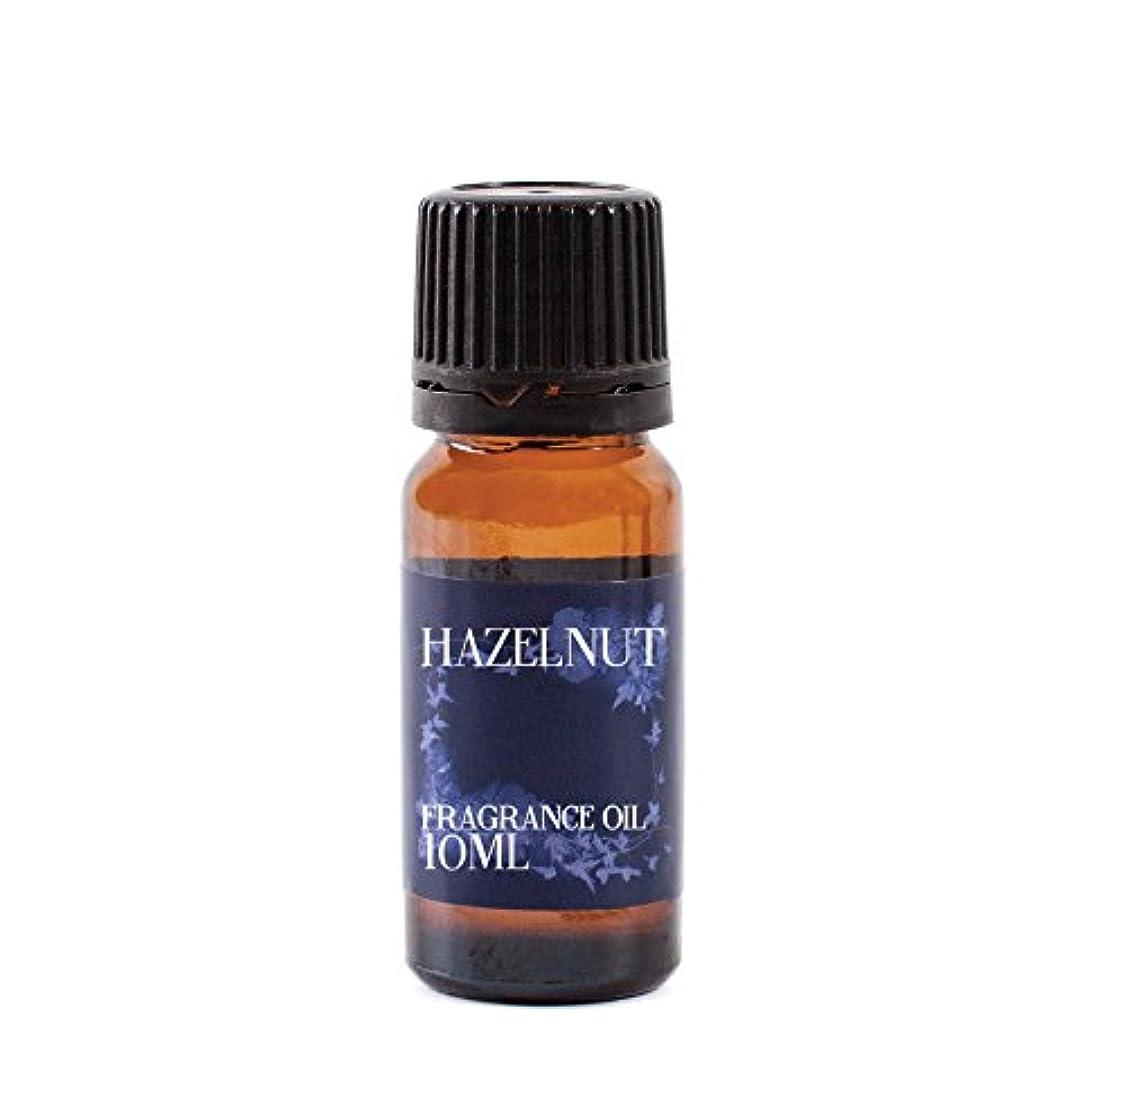 Mystic Moments | Hazelnut Fragrance Oil - 10ml